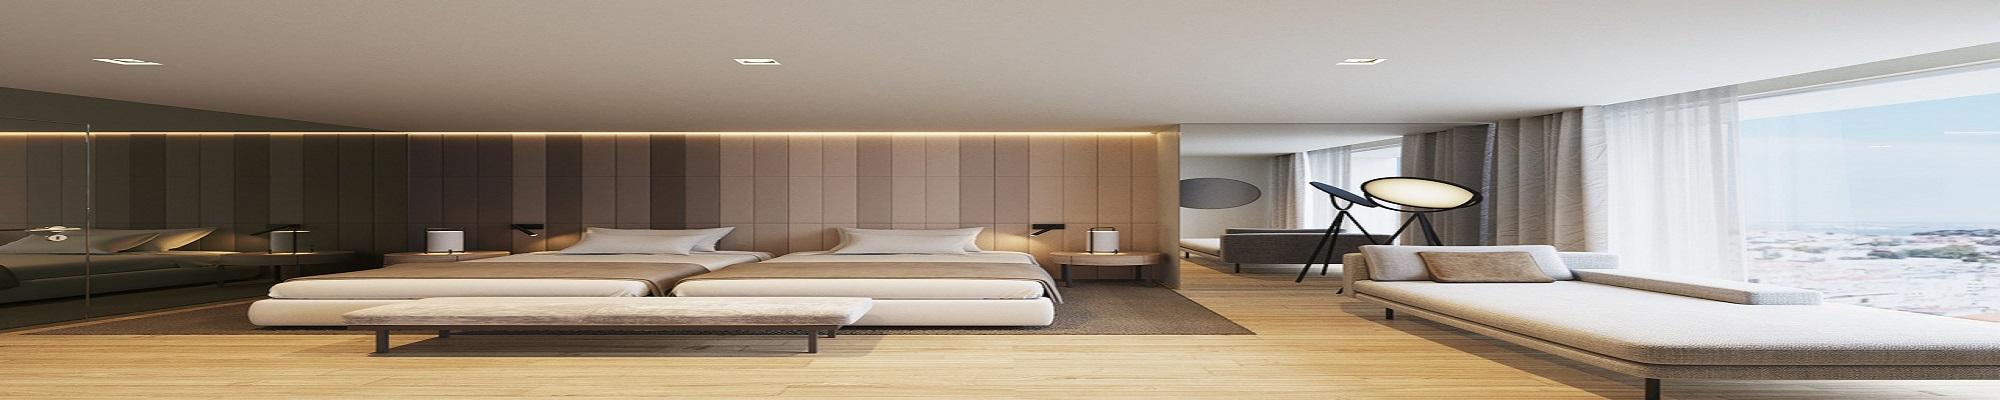 suite 10_C2 - Cópia